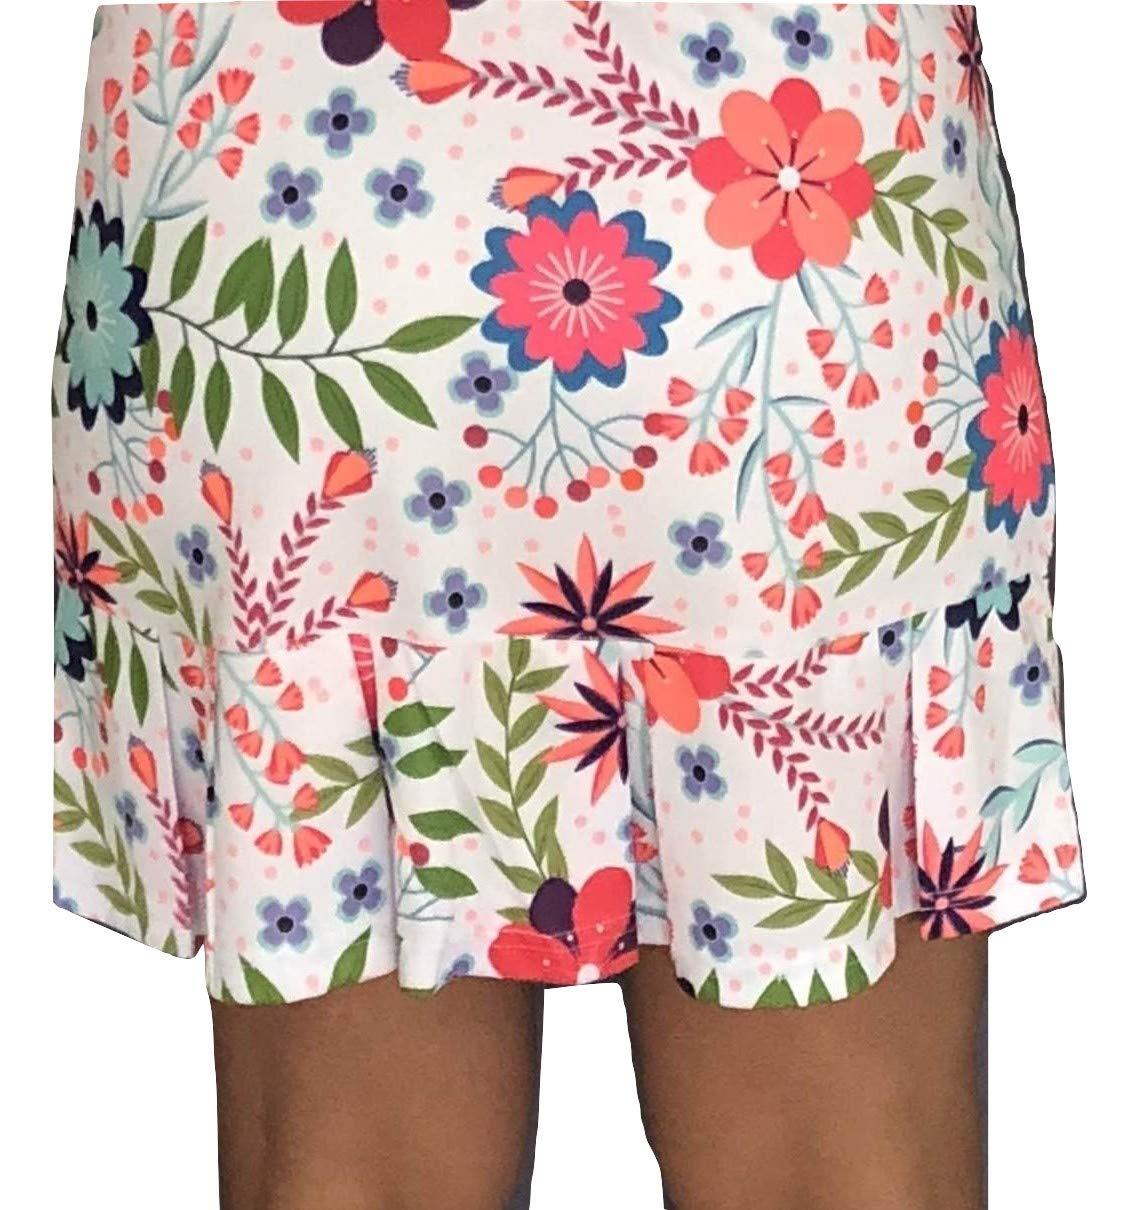 Tennis Skirt, Skort in Print, Frill at The Bottom (Large)